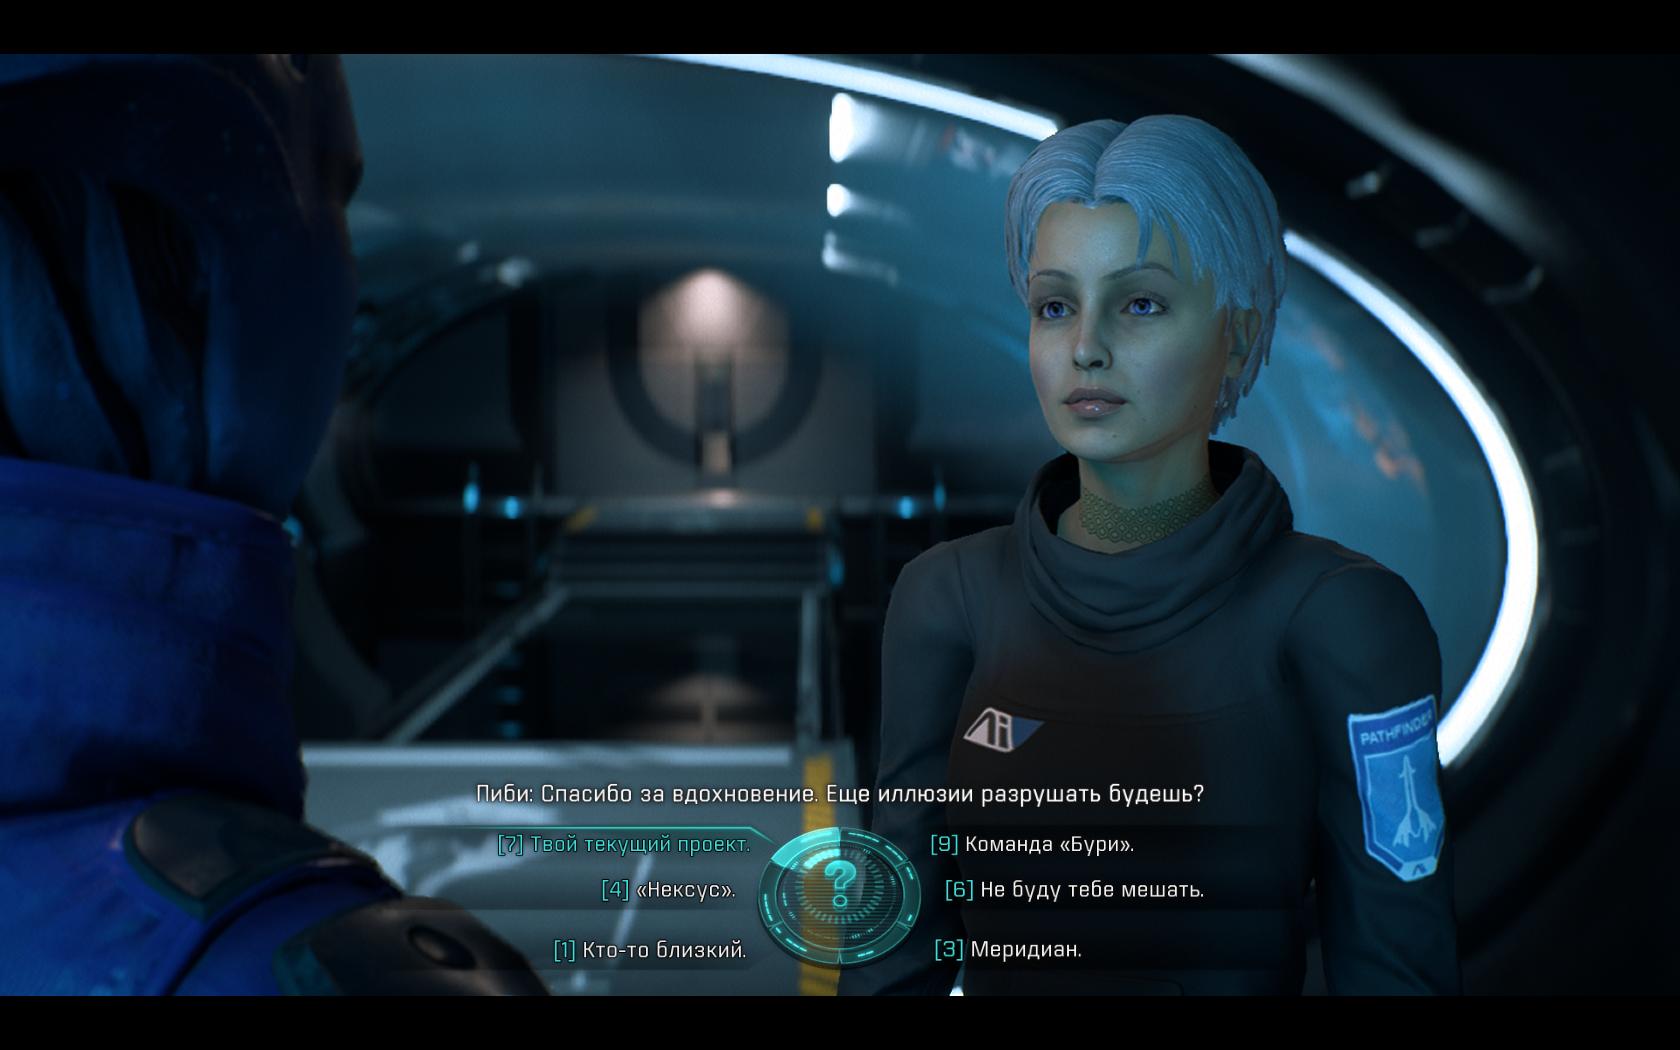 Mass Effect Andromeda Screenshot 2018.10.11 - 21.01.43.55.png - Mass Effect: Andromeda